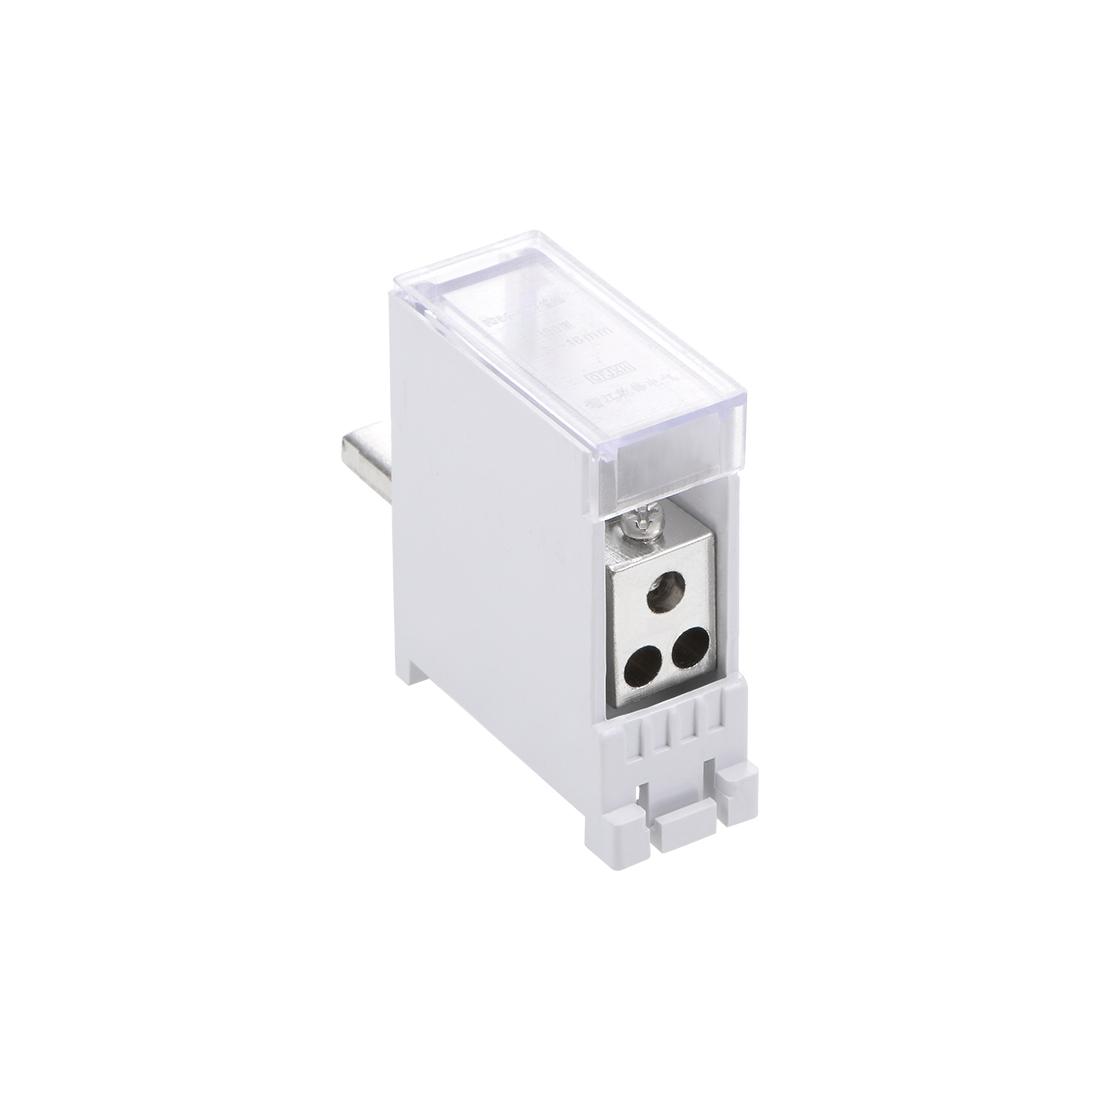 1 Inlet 3 Outlet Terminal Blocks DIN Rail Distribution Block for Circuit Breaker